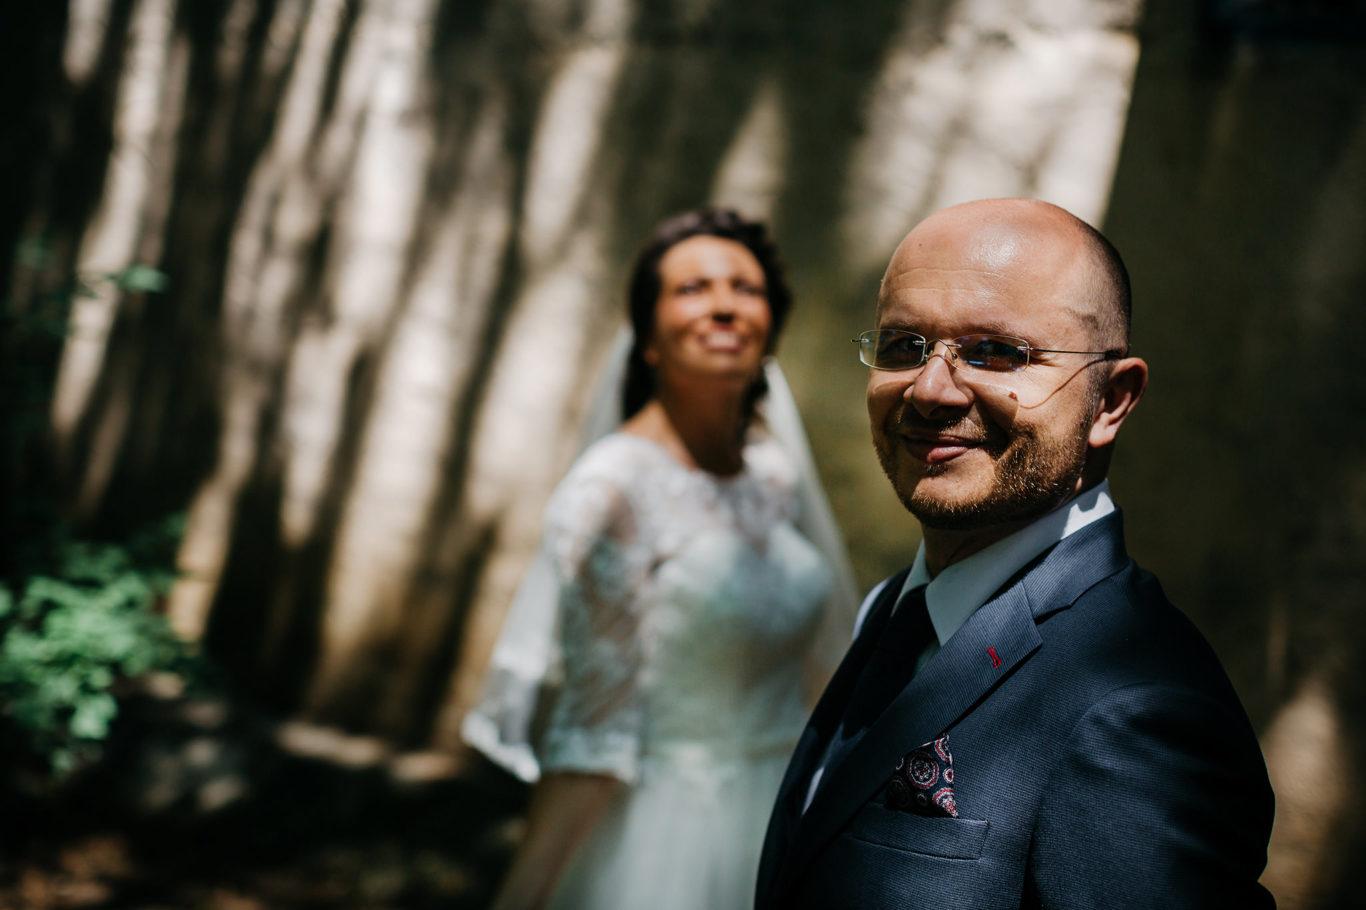 0293-fotografie-nunta-bucuresti-anca-george-fotograf-ciprian-dumitrescu-dcf_4543